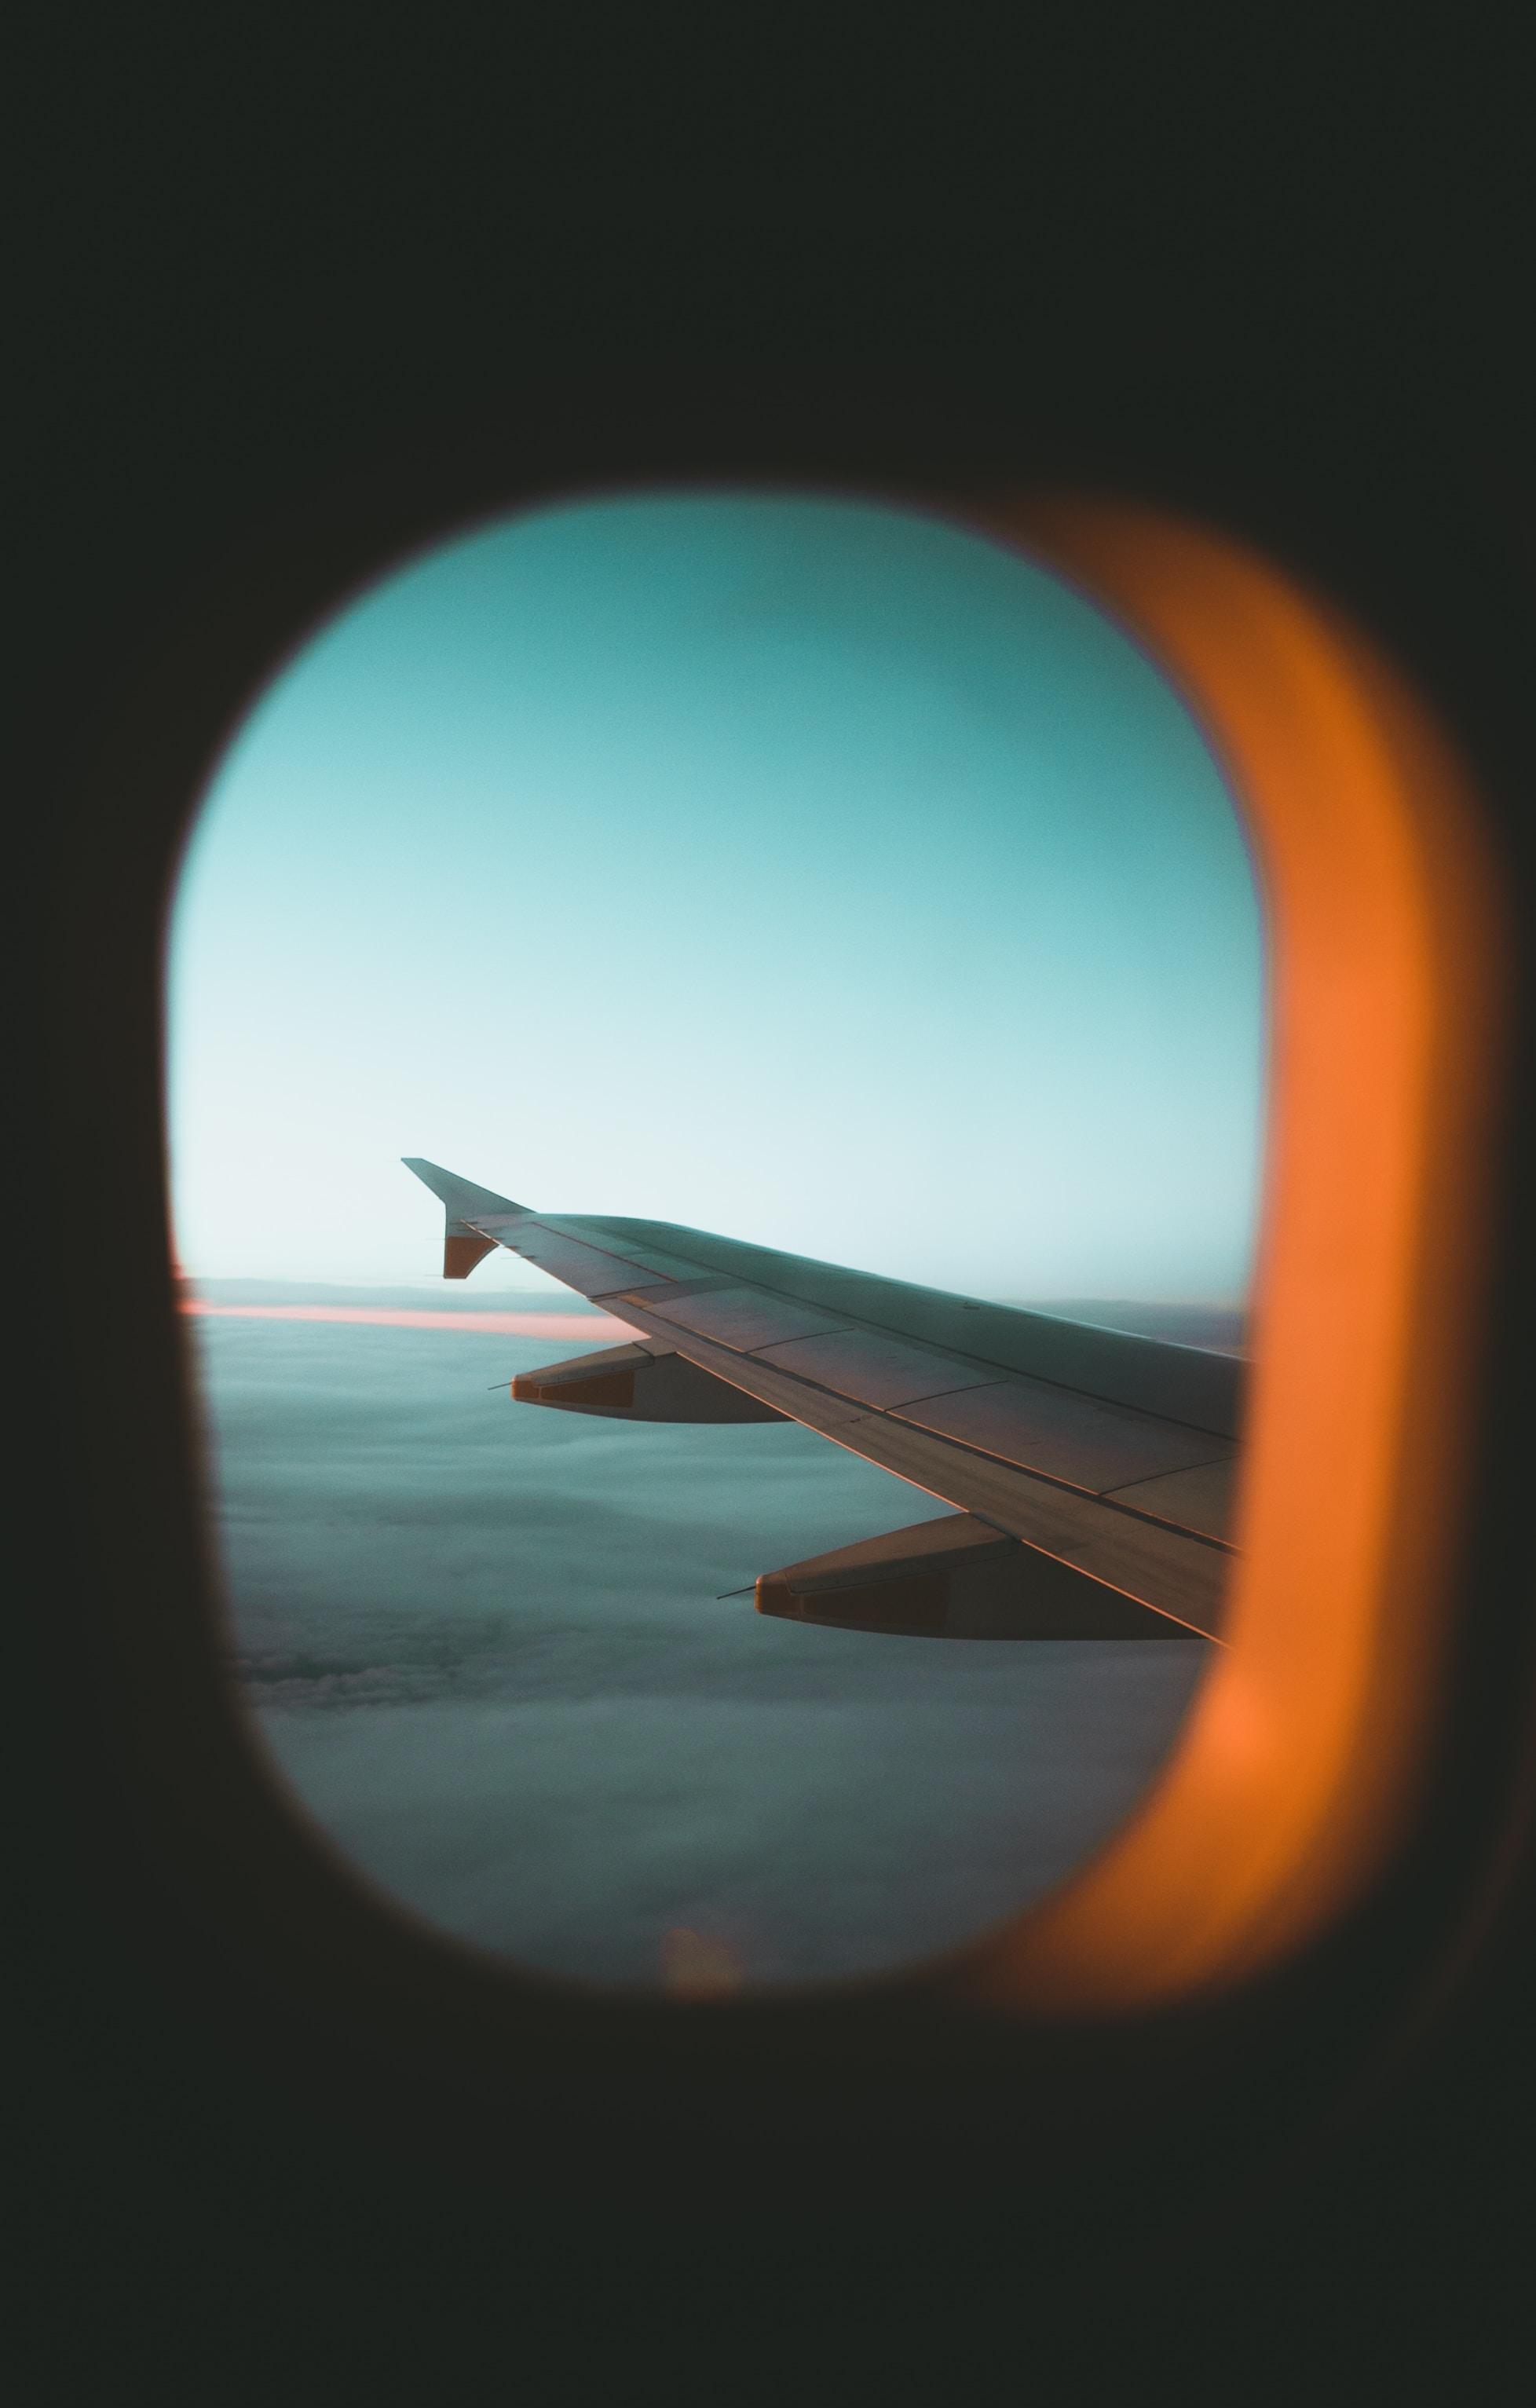 plane wing through glass window